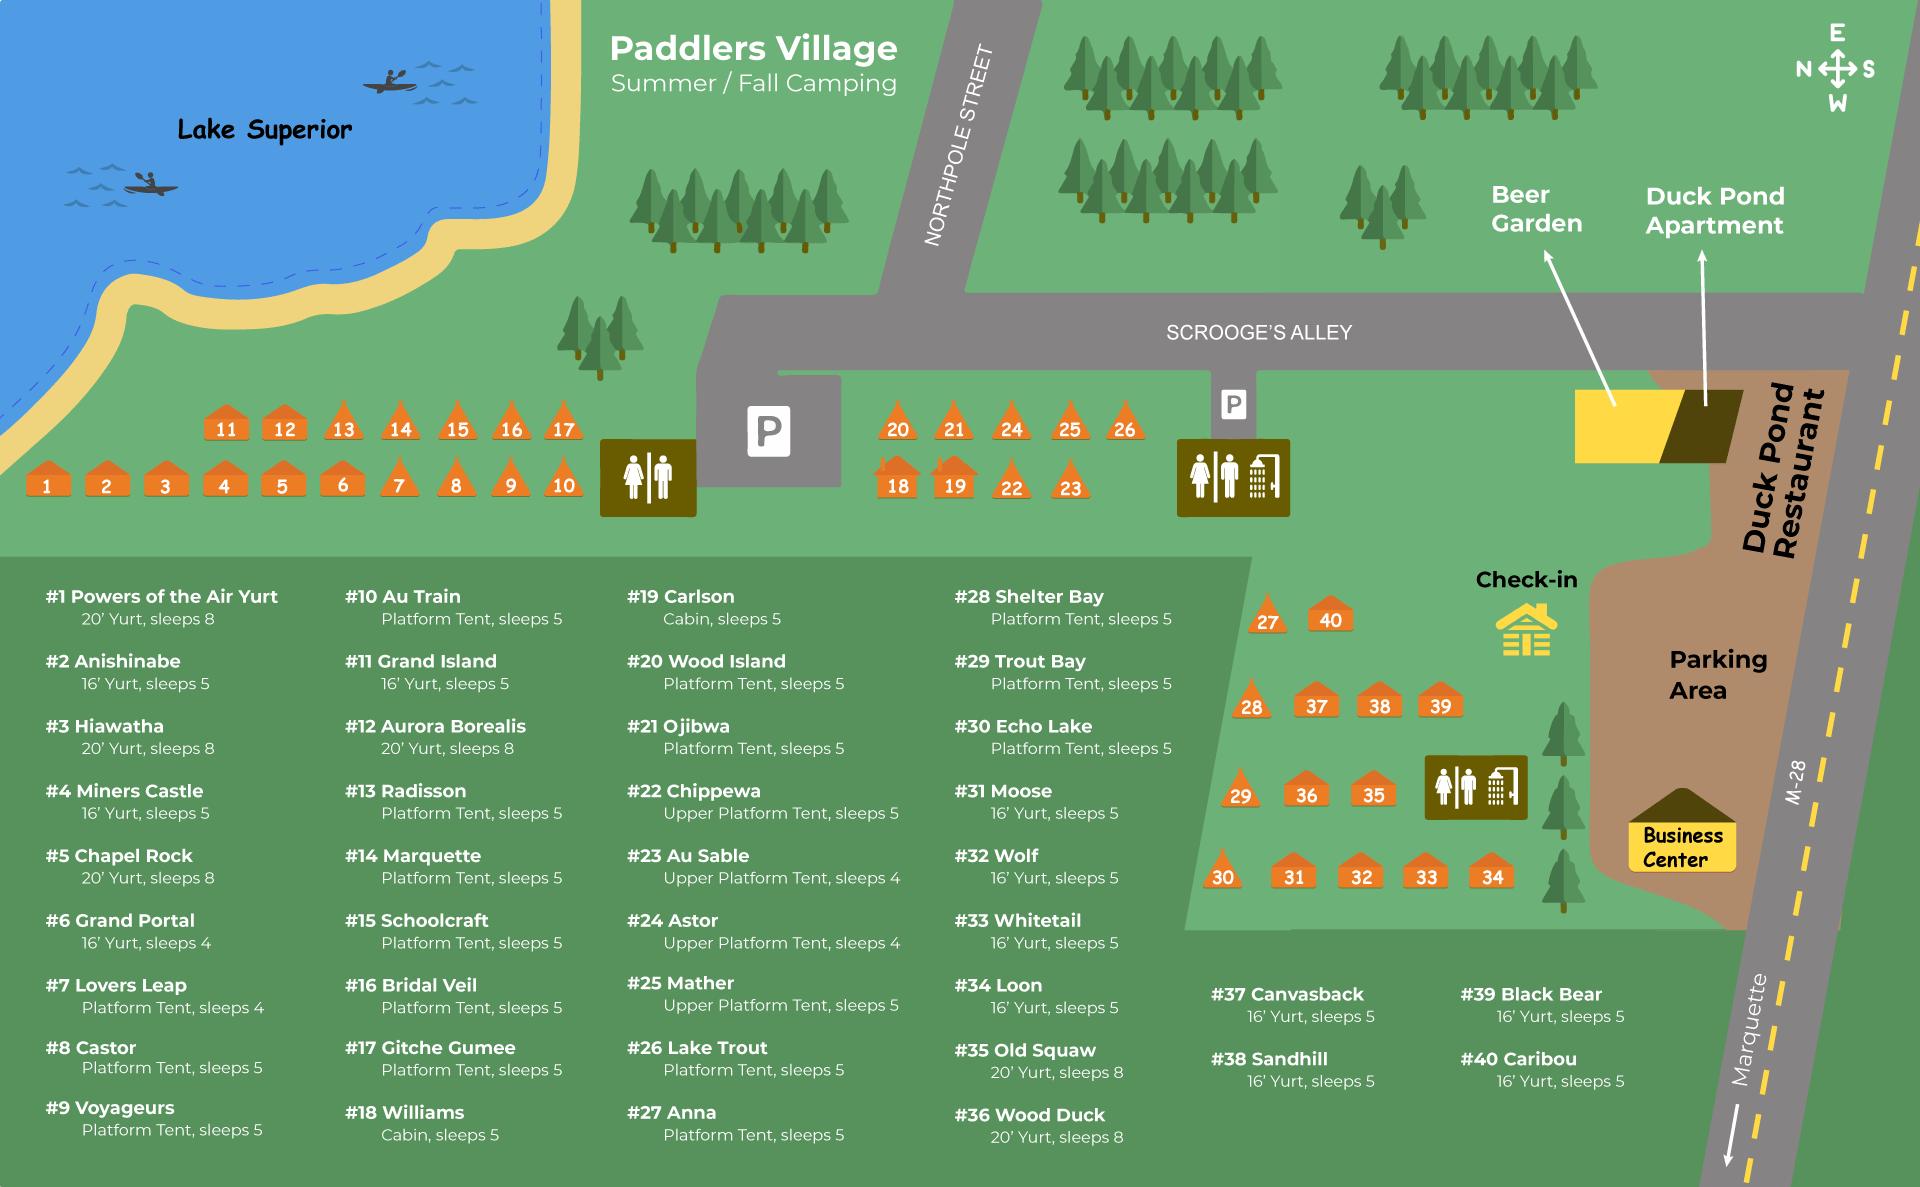 paddlers-village-map-2019